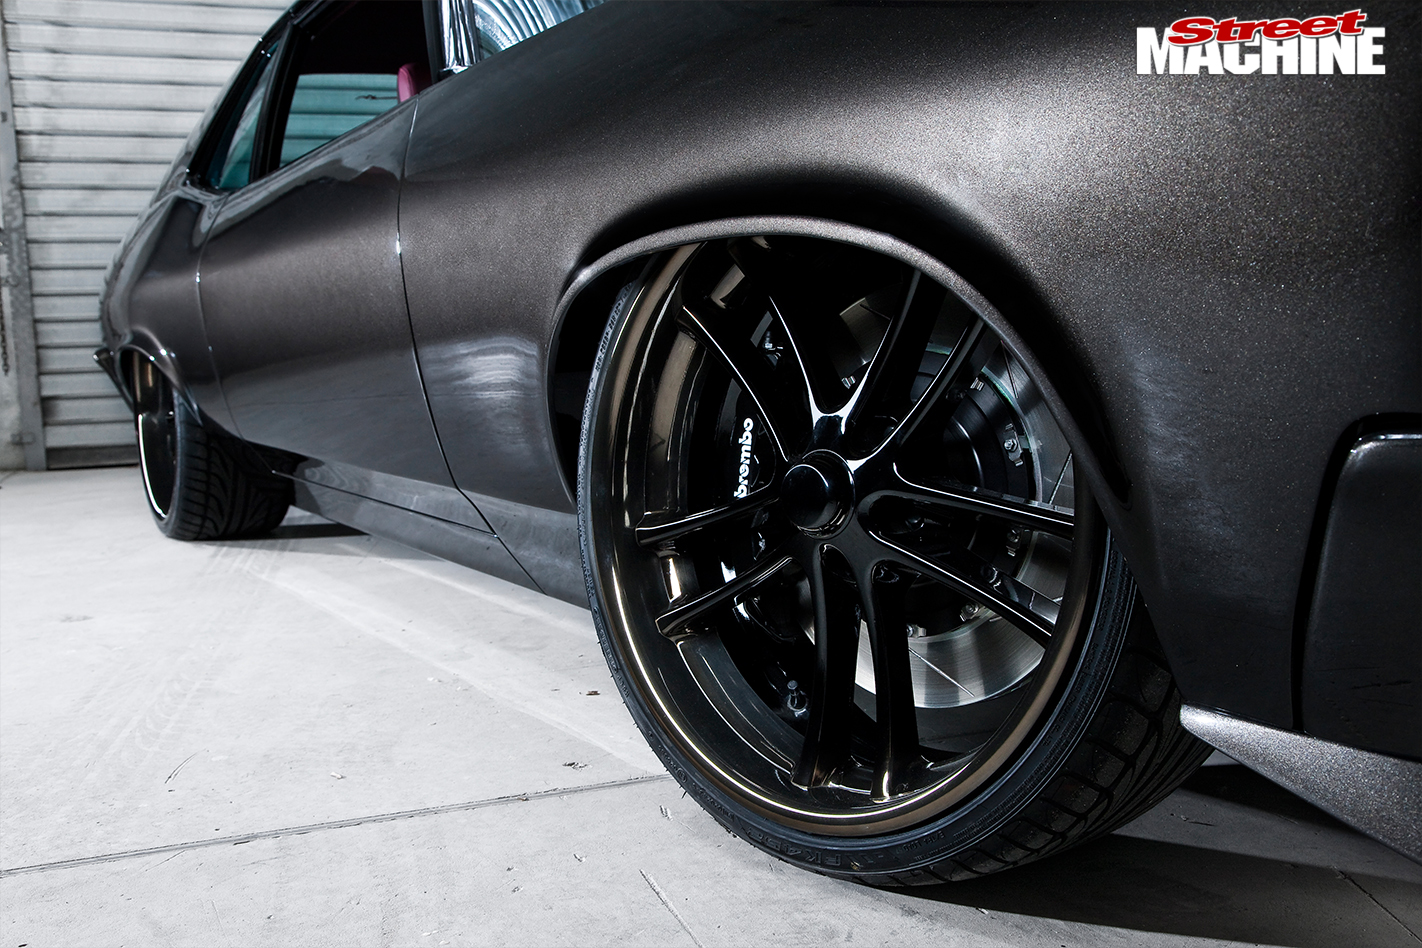 KAM-Nova -Chevy -wheel